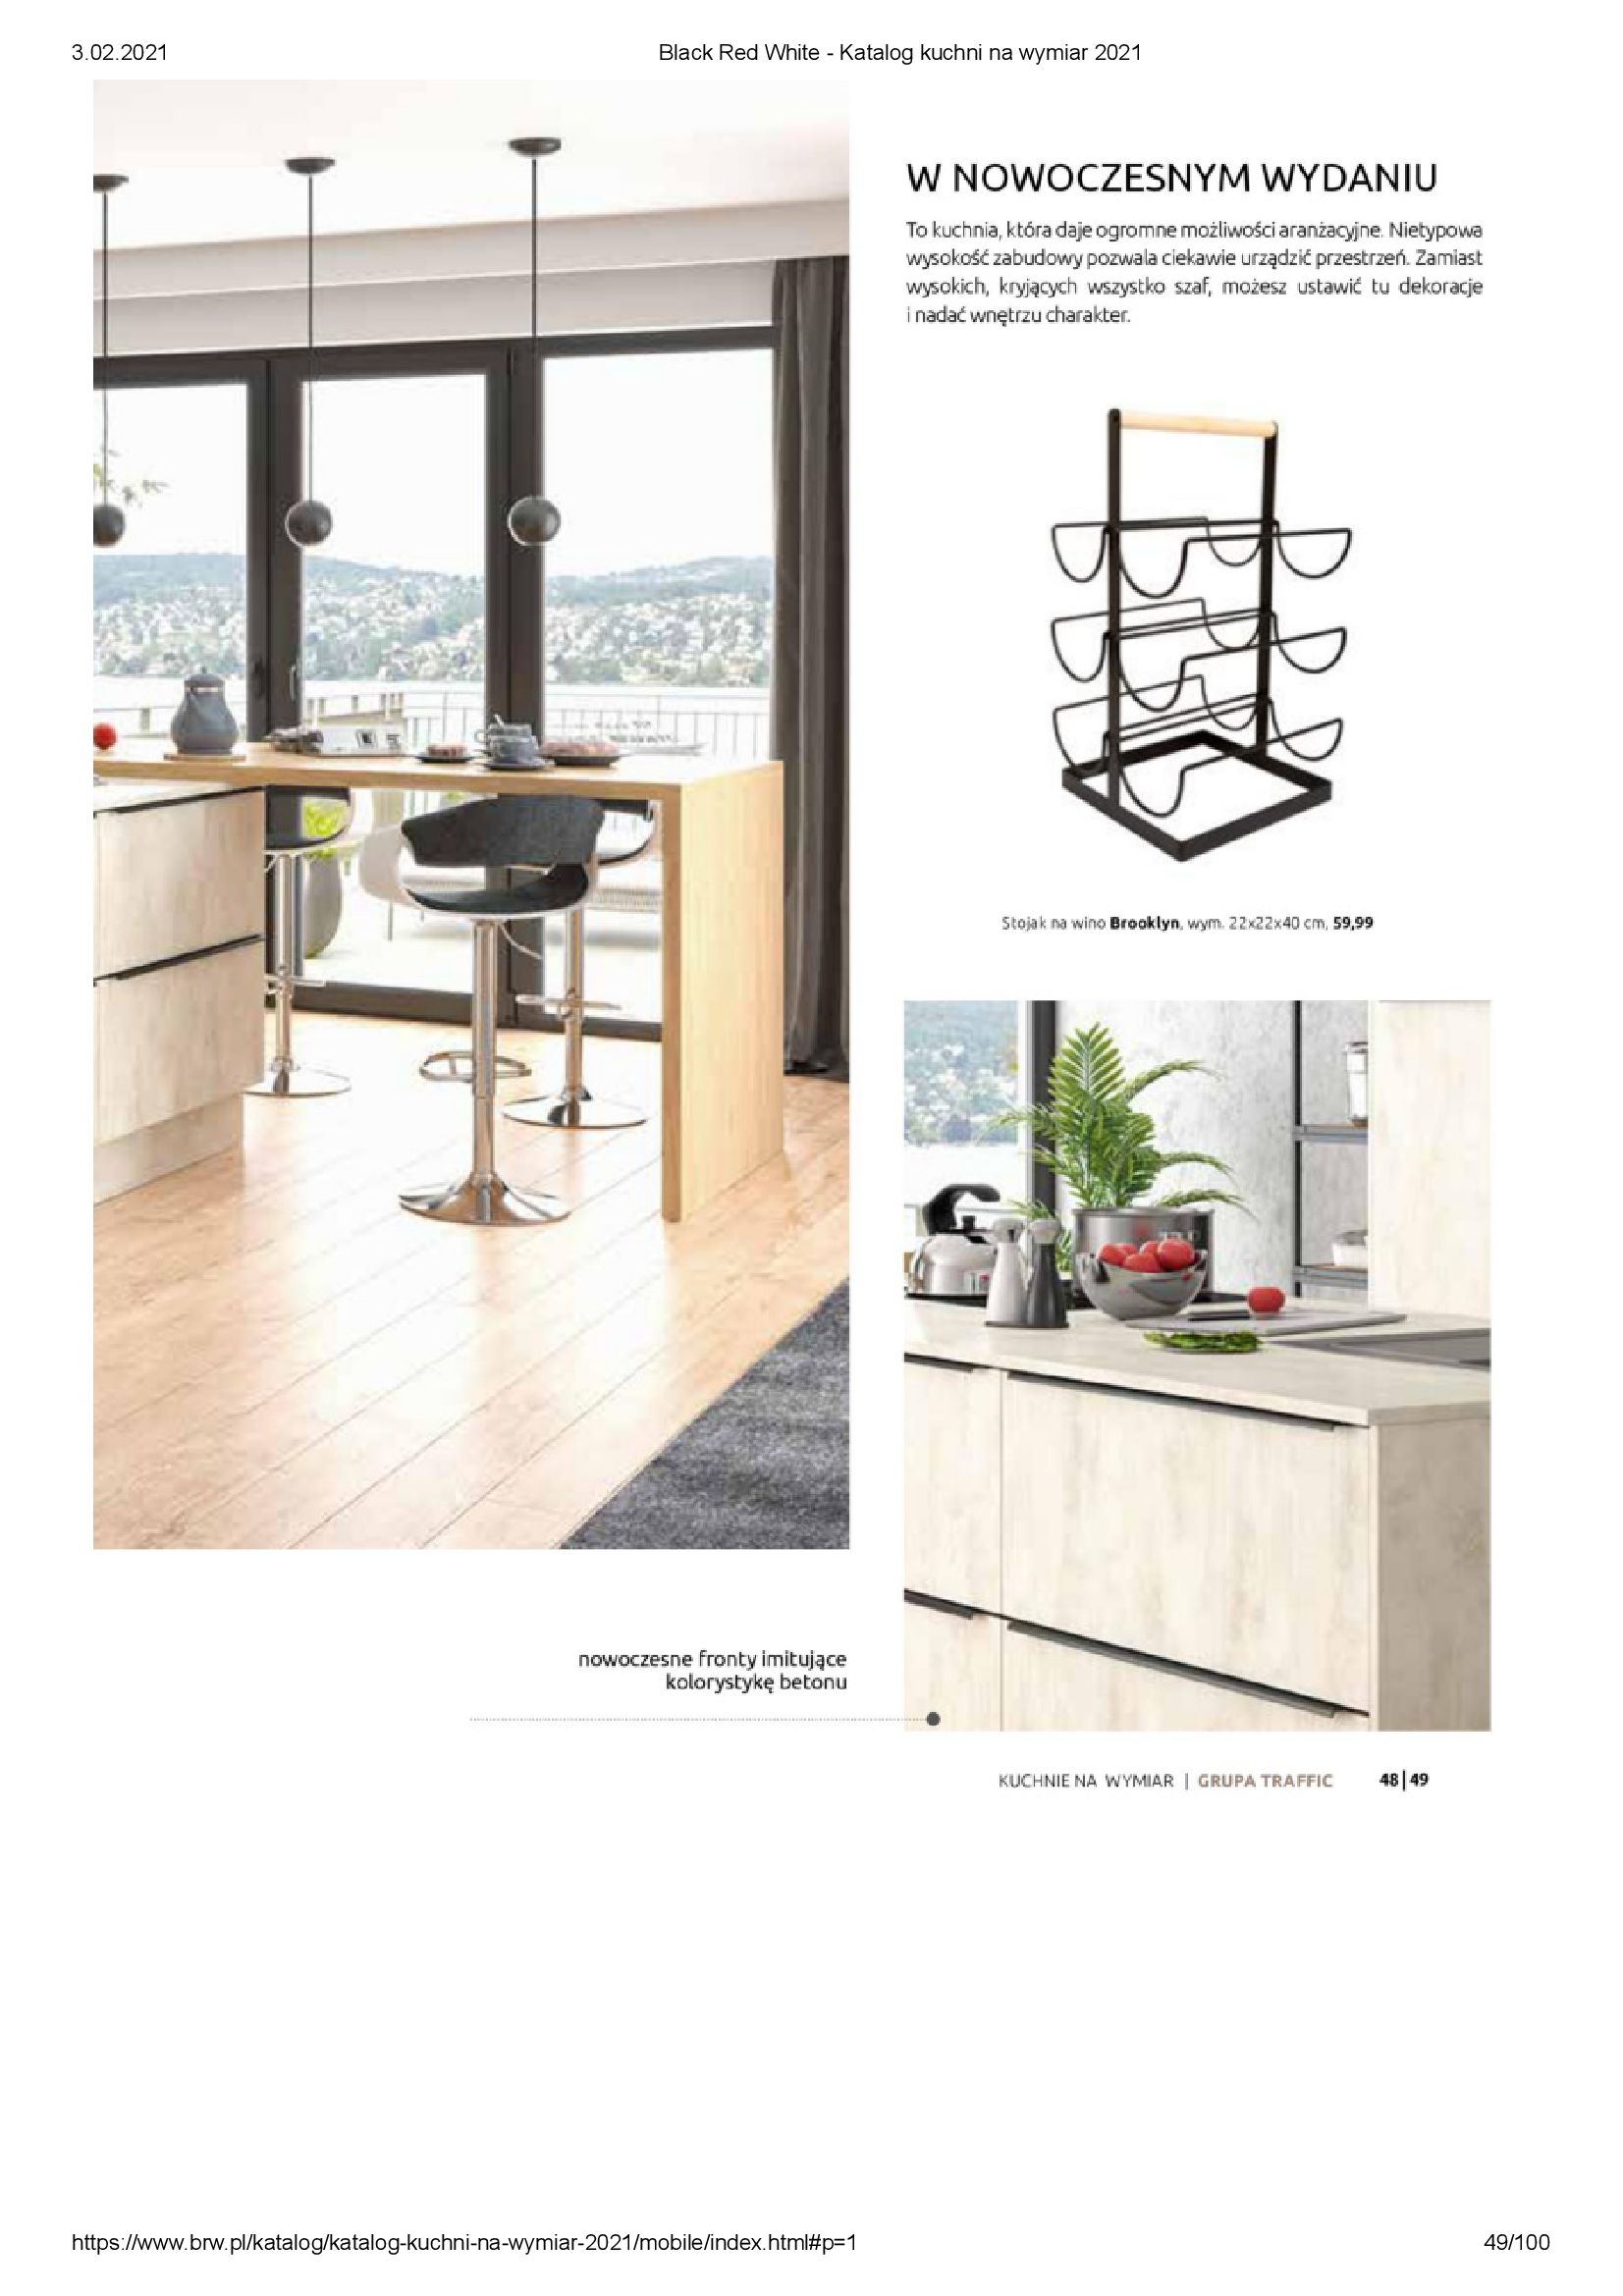 Gazetka Black Red White: Katalog - Kuchnie na wymiar Senso Kitchens 2021 2021-01-01 page-49